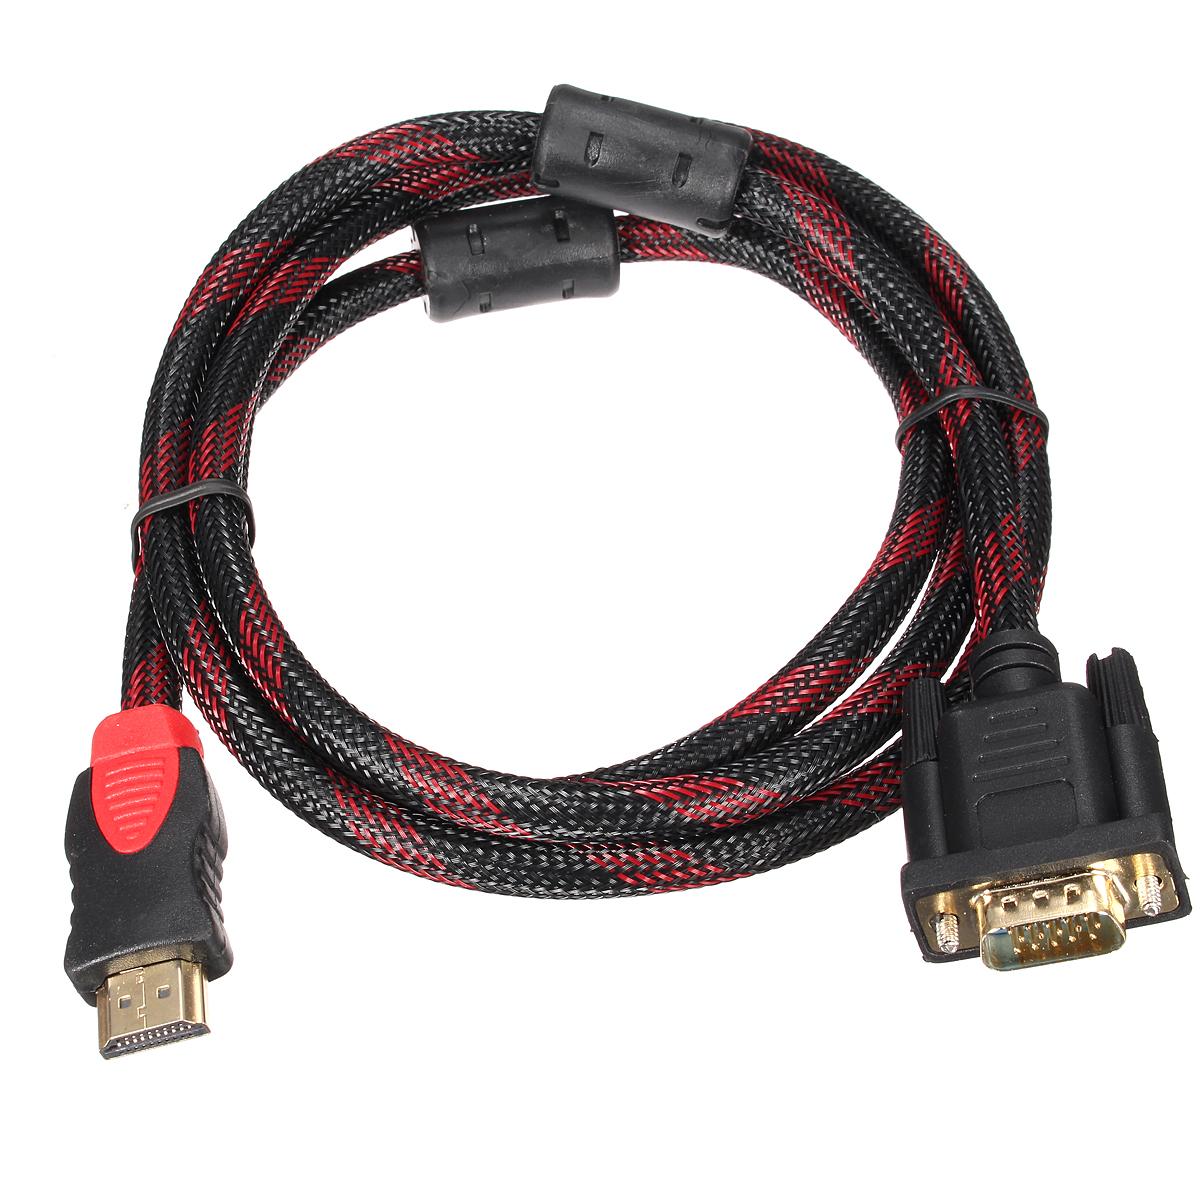 1080p hdmi male a vga male video cable adaptateur convertisseur pr pc hdtv 1 5m lazada ph. Black Bedroom Furniture Sets. Home Design Ideas